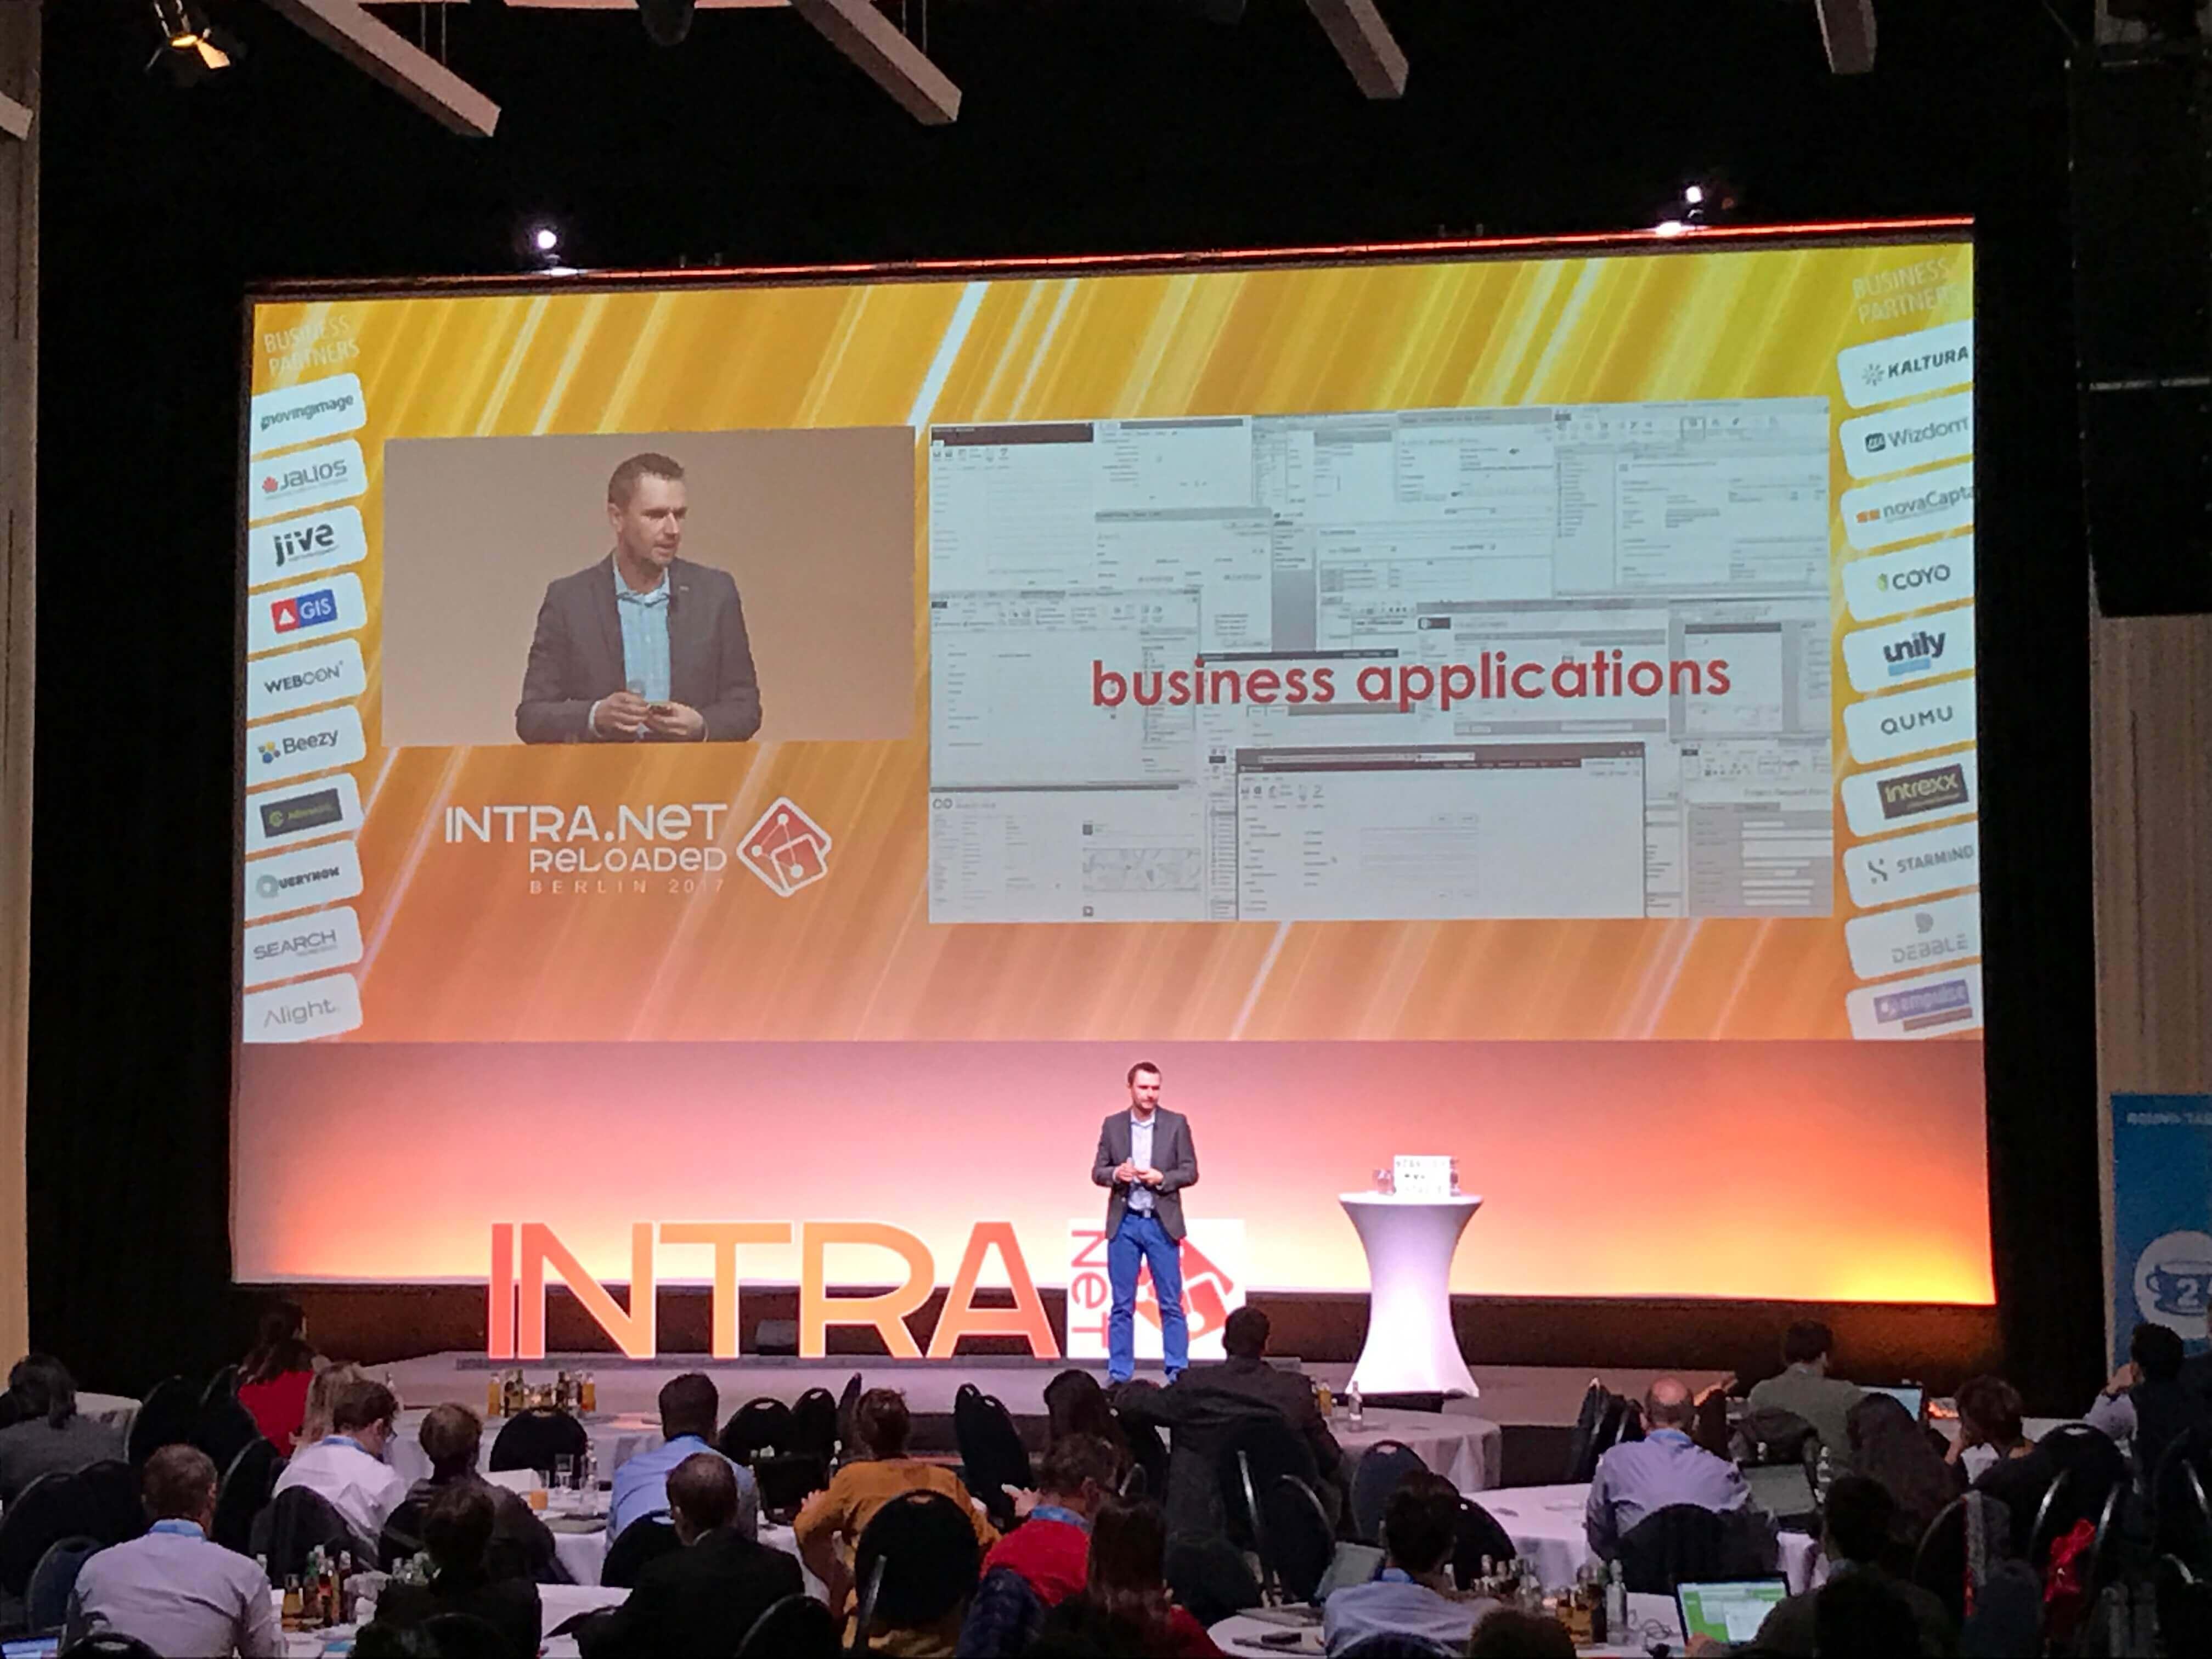 WEBCO BPM presentation at Intra.NET Reloaded Berlin 2017